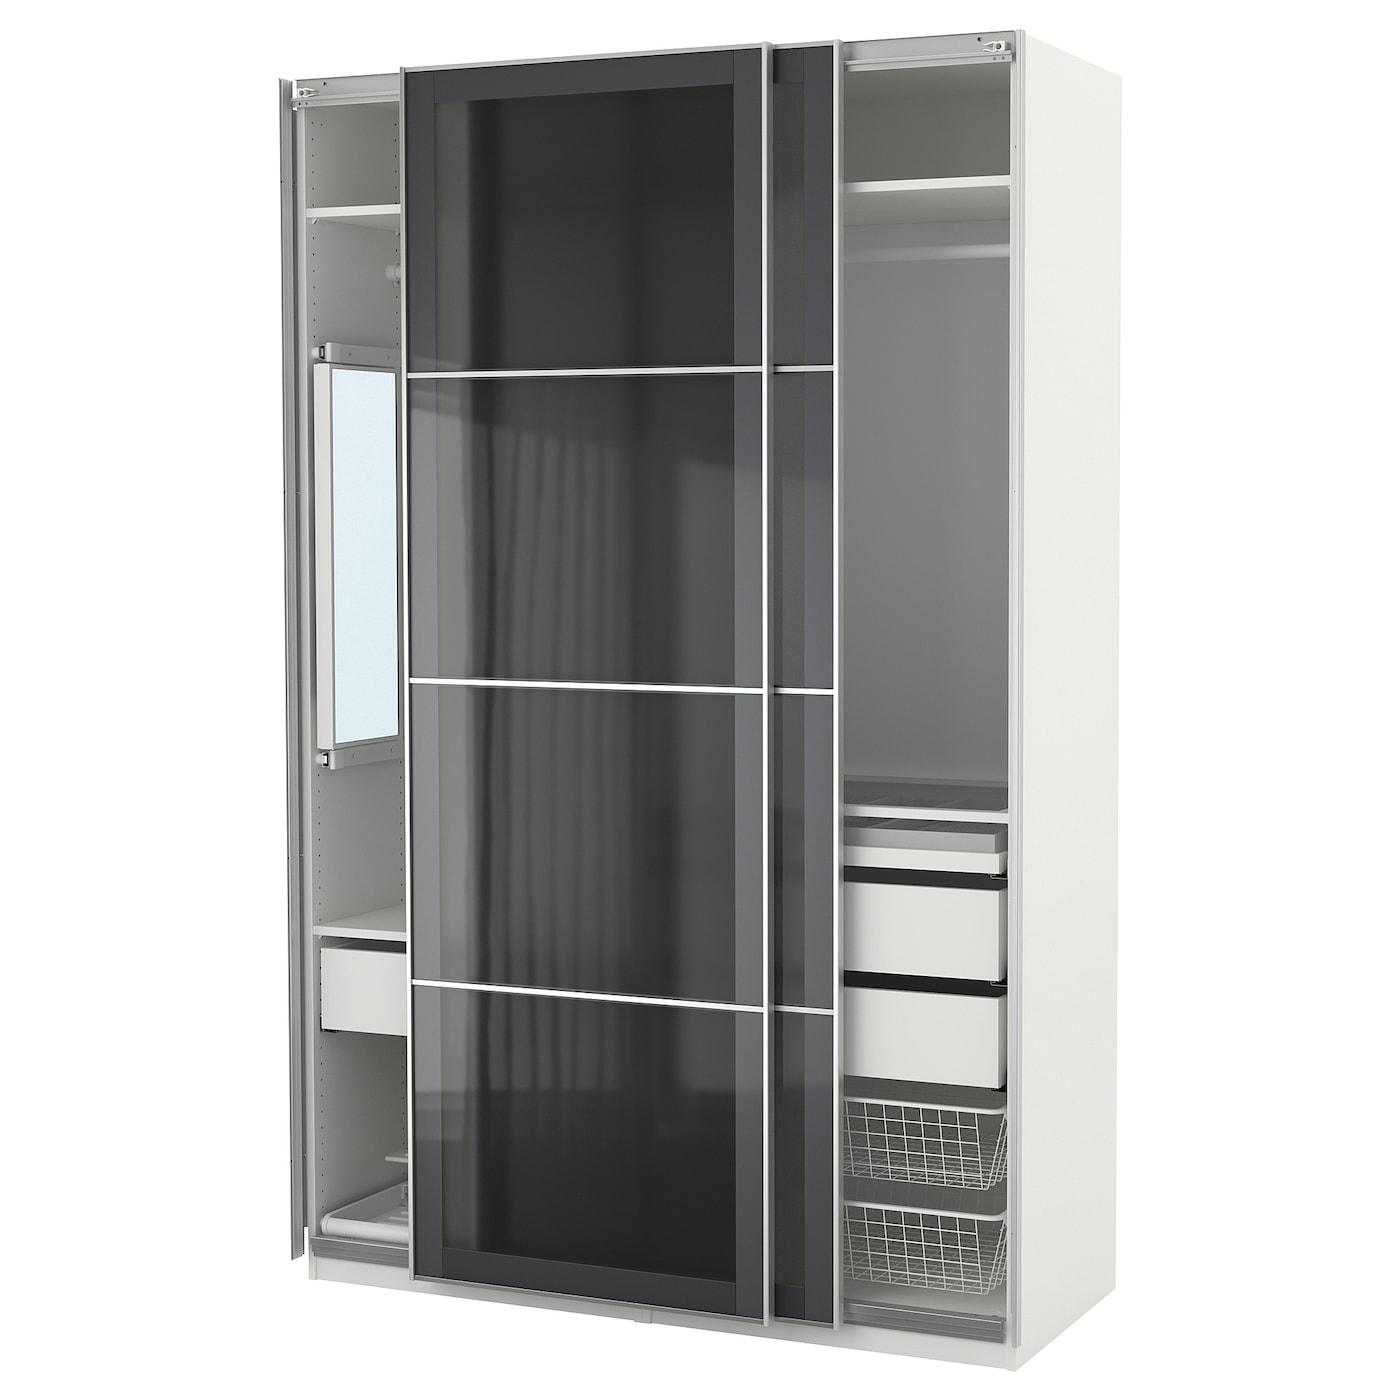 Pax armario blanco uggdal vidrio gris 150 x 66 x 236 cm ikea - Ikea armarios modulares ...